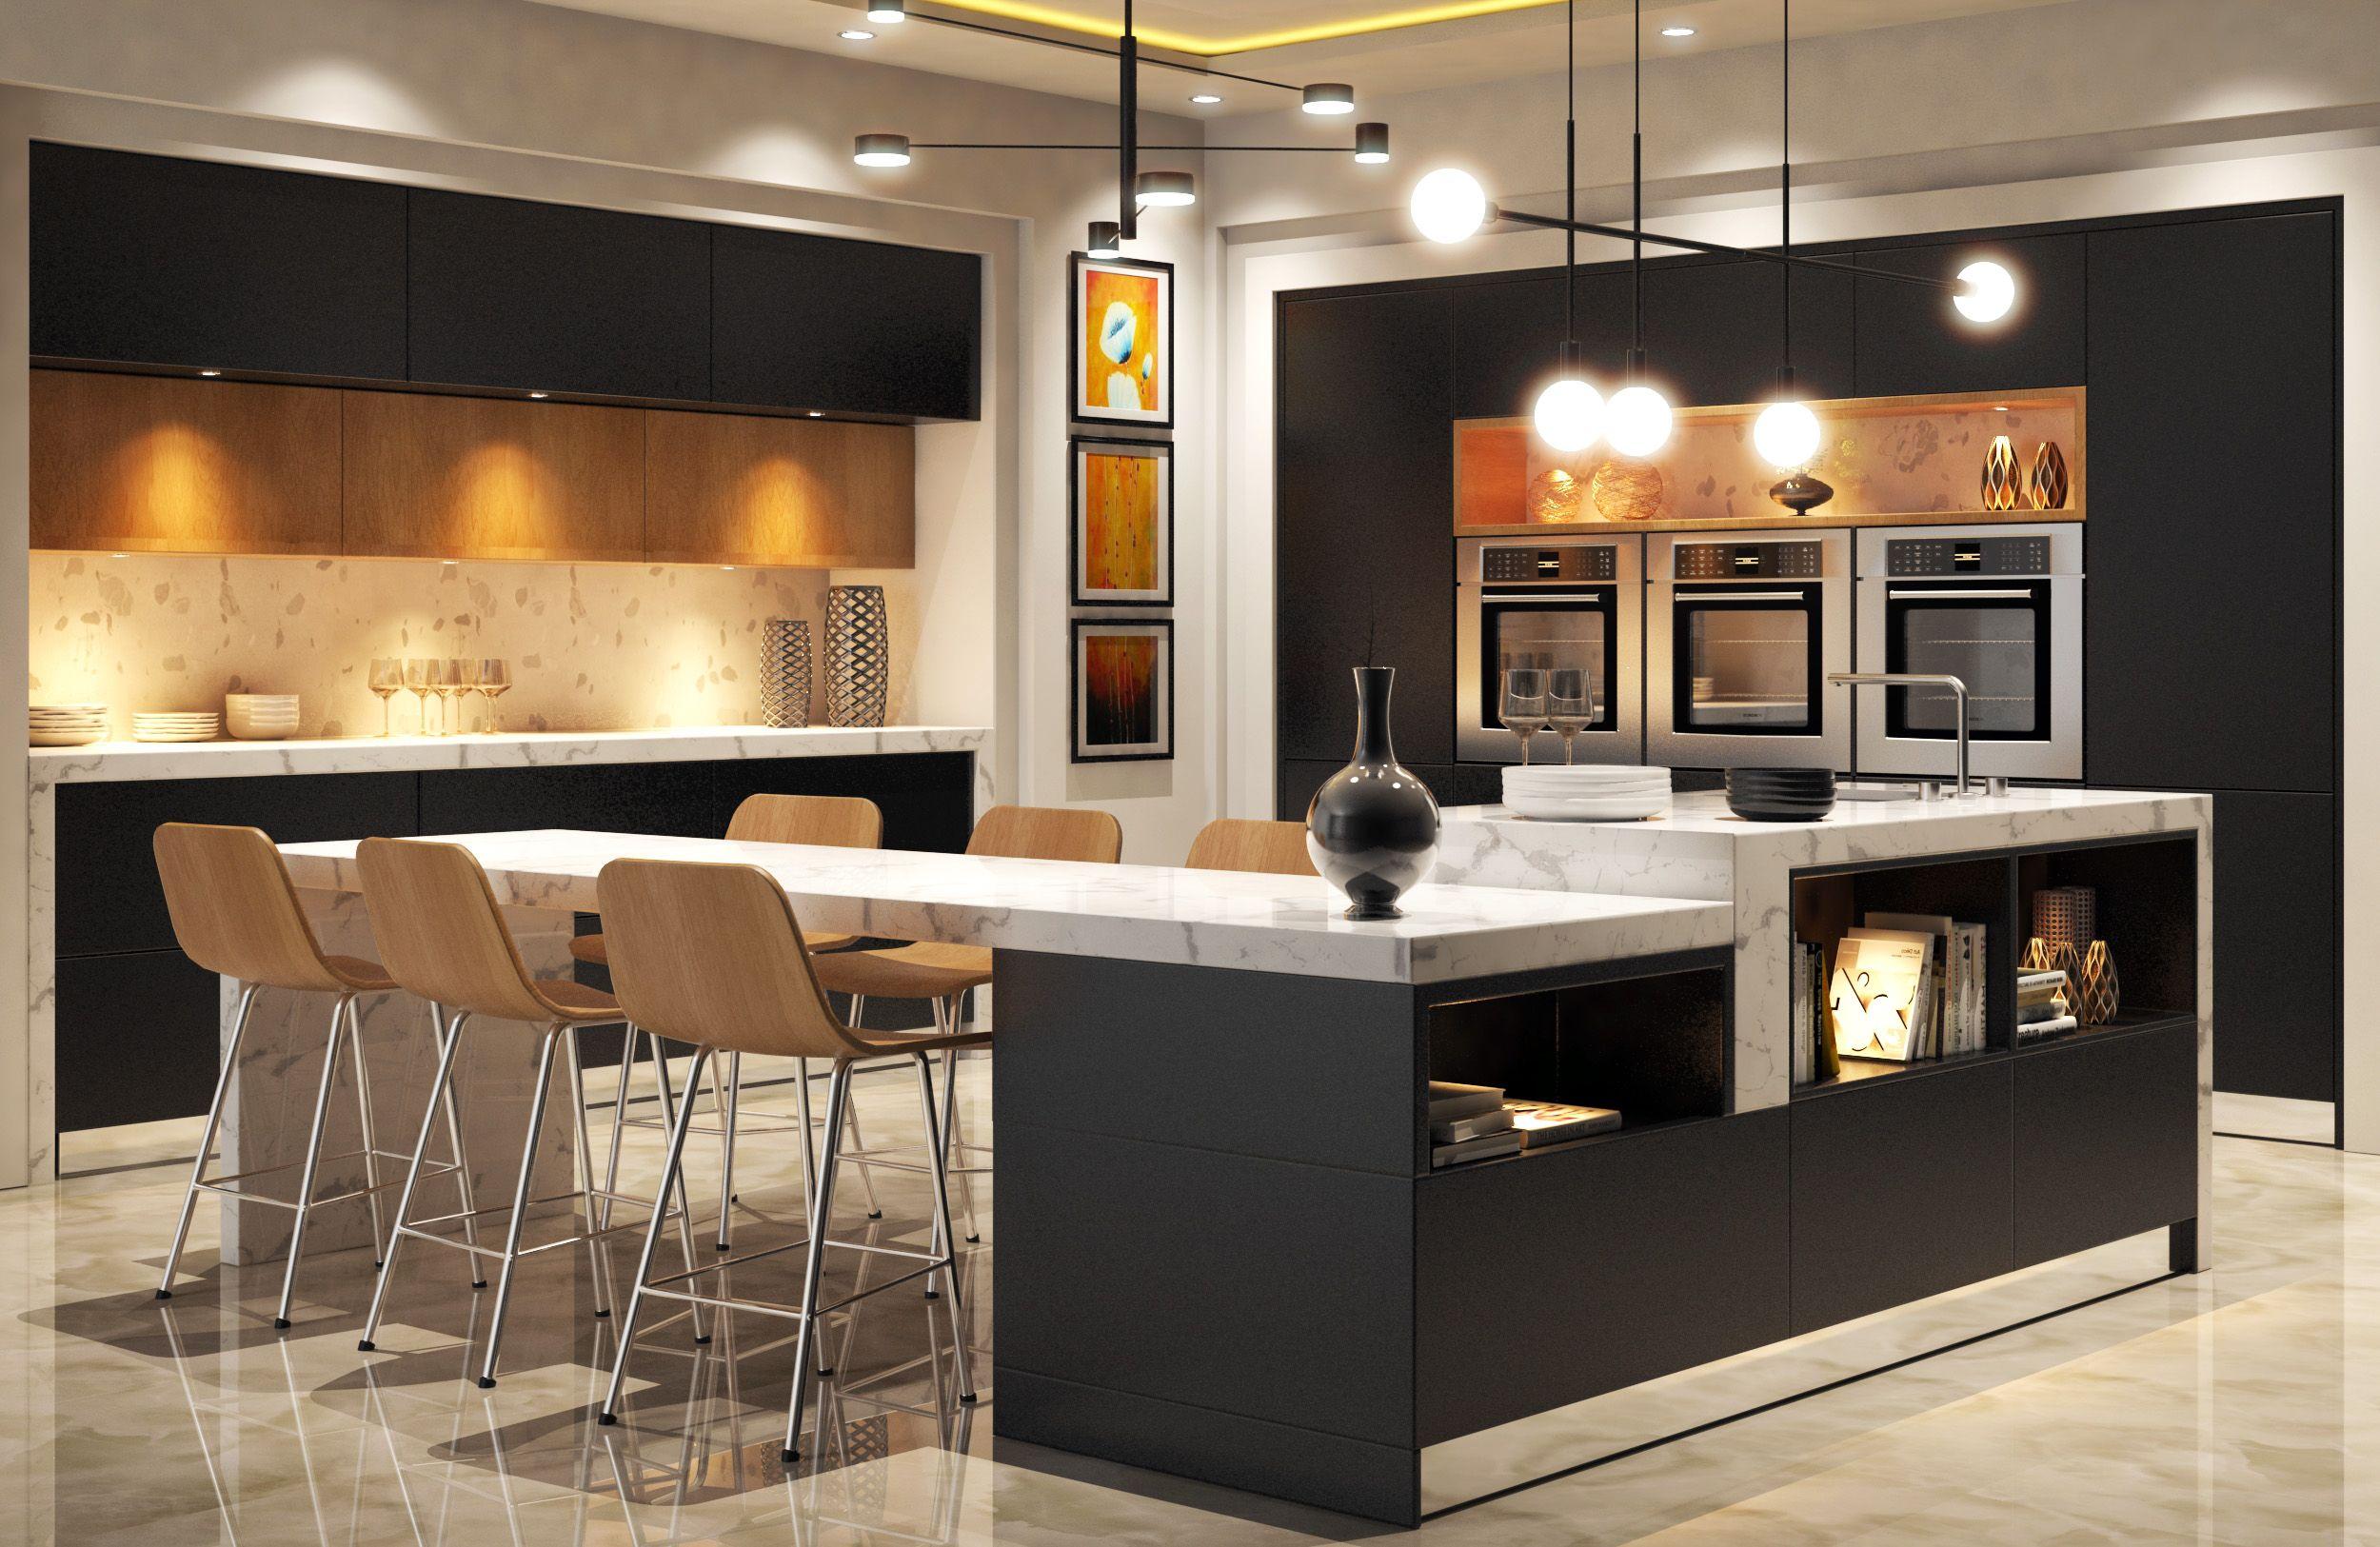 Modern Kitchen 7D Model- a model of a Modern Kitchen model